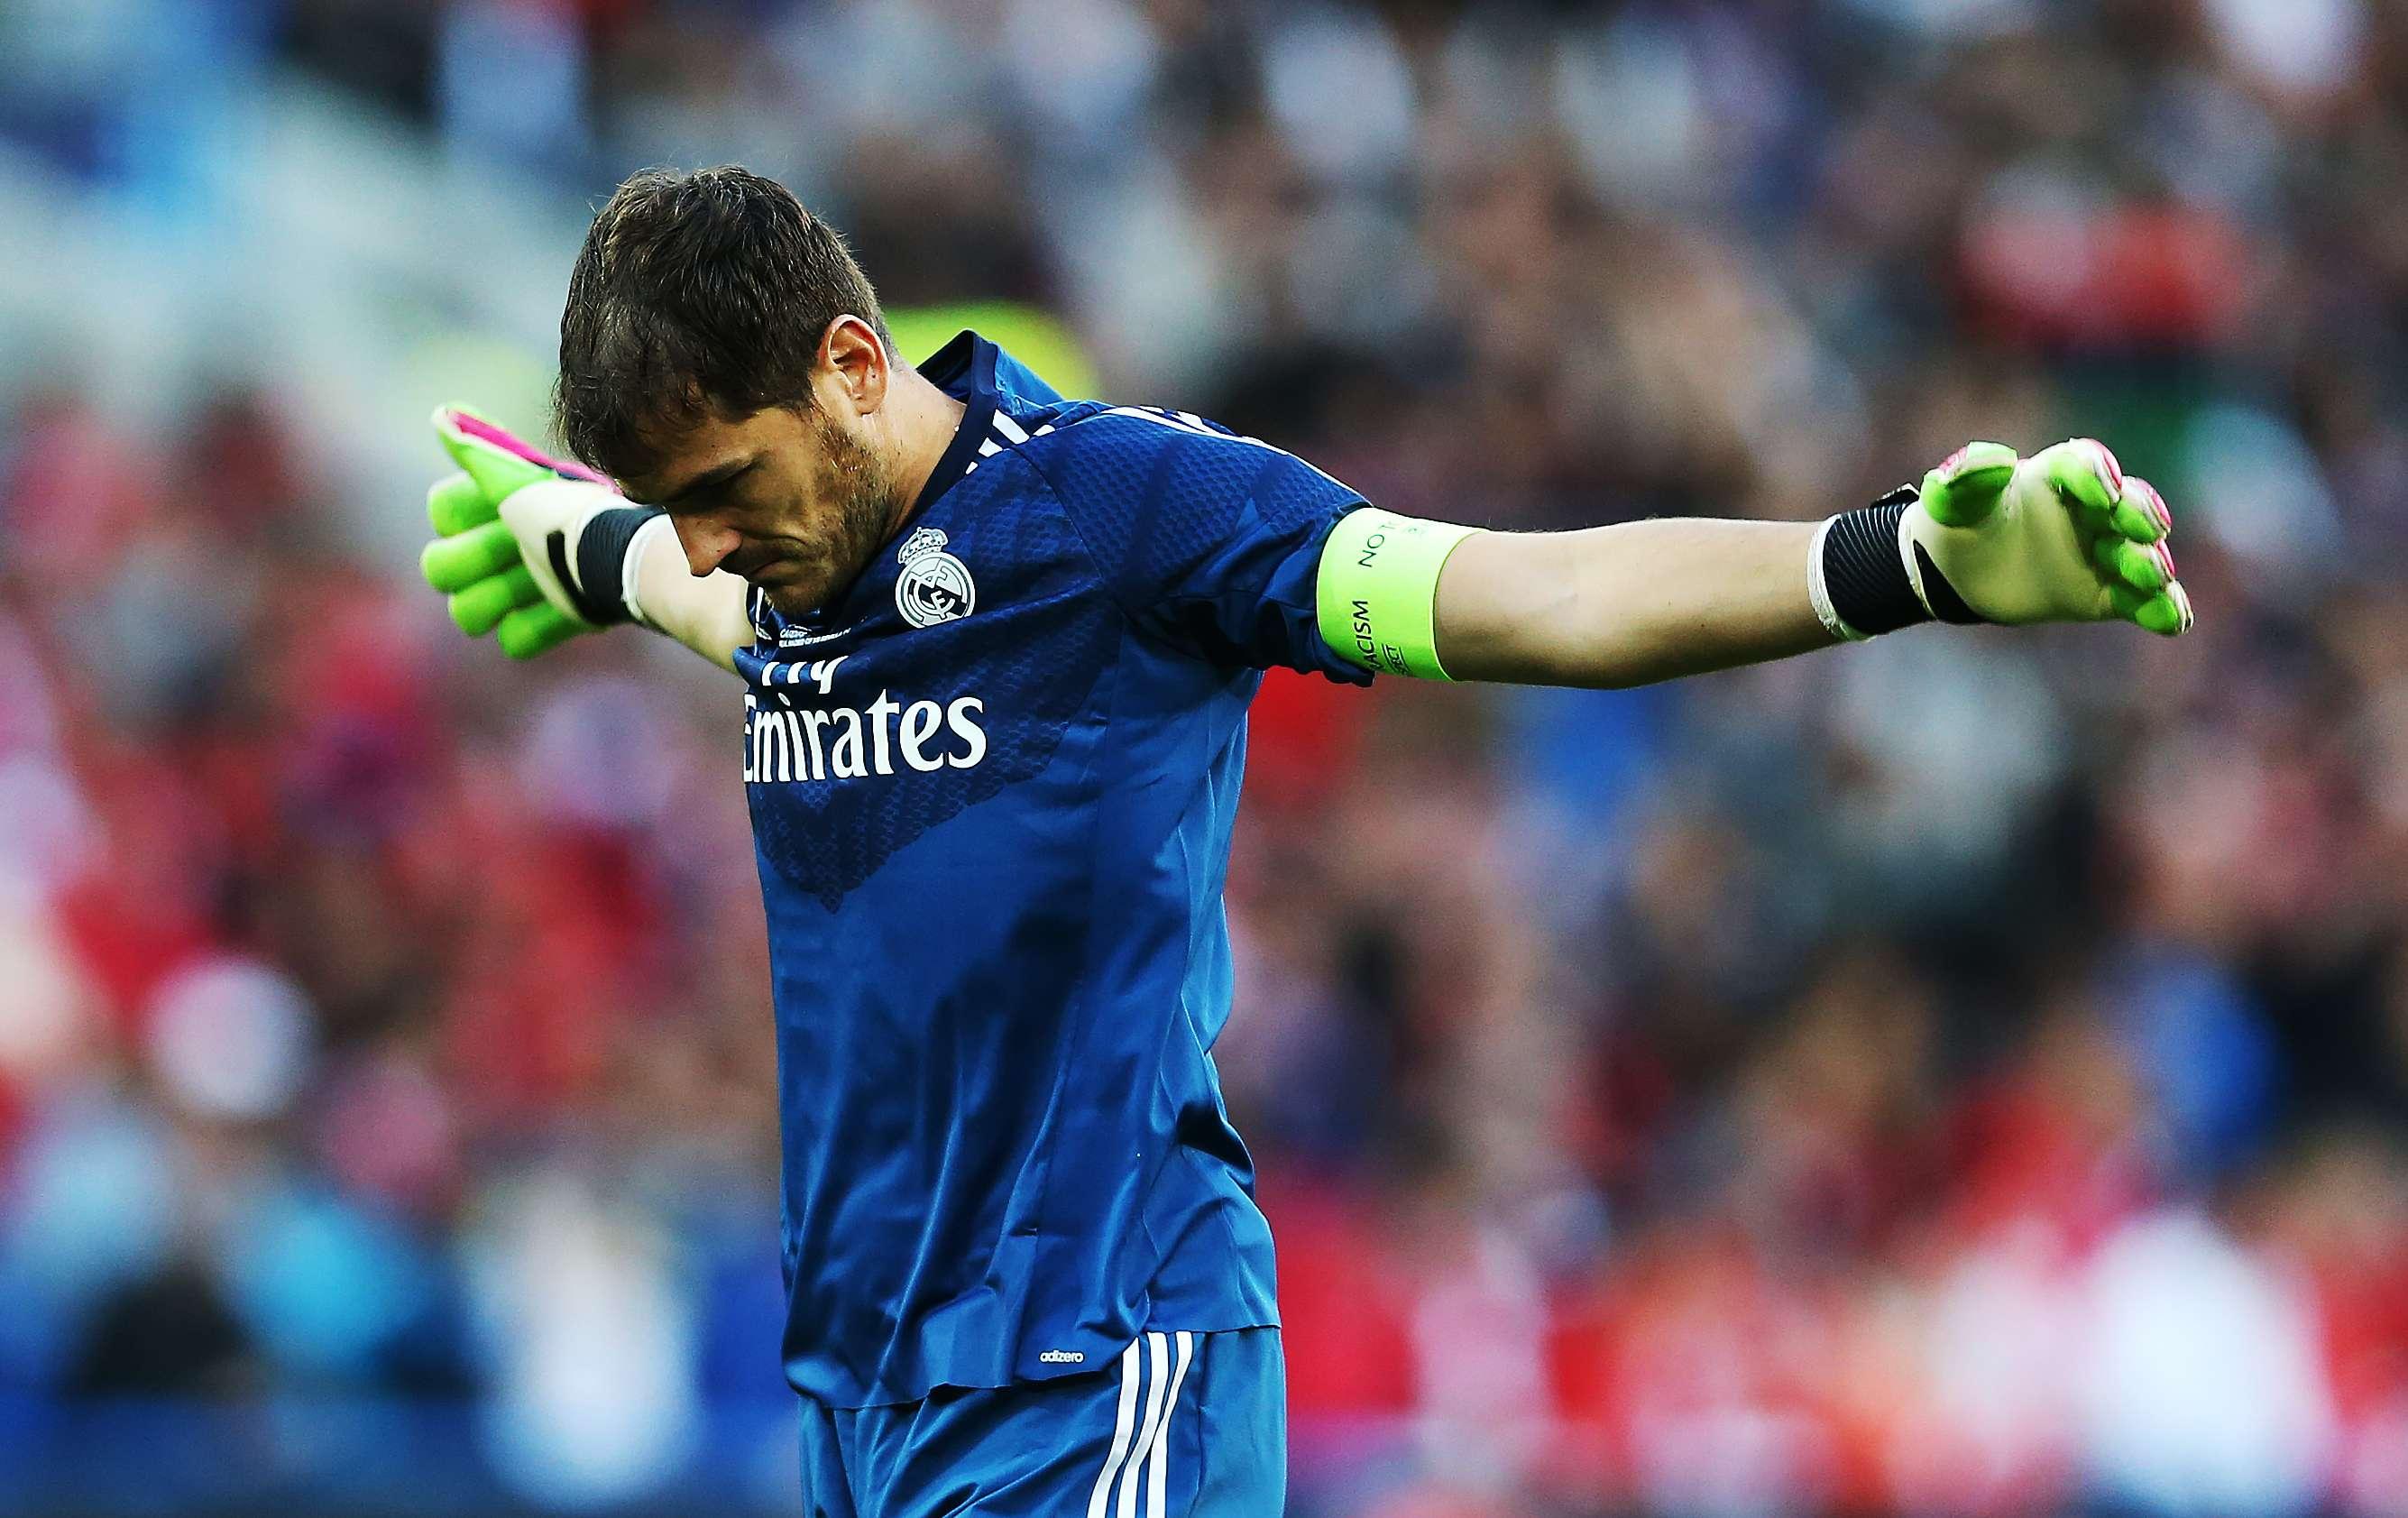 Iker Casillas fue abucheado. Foto: Getty Images